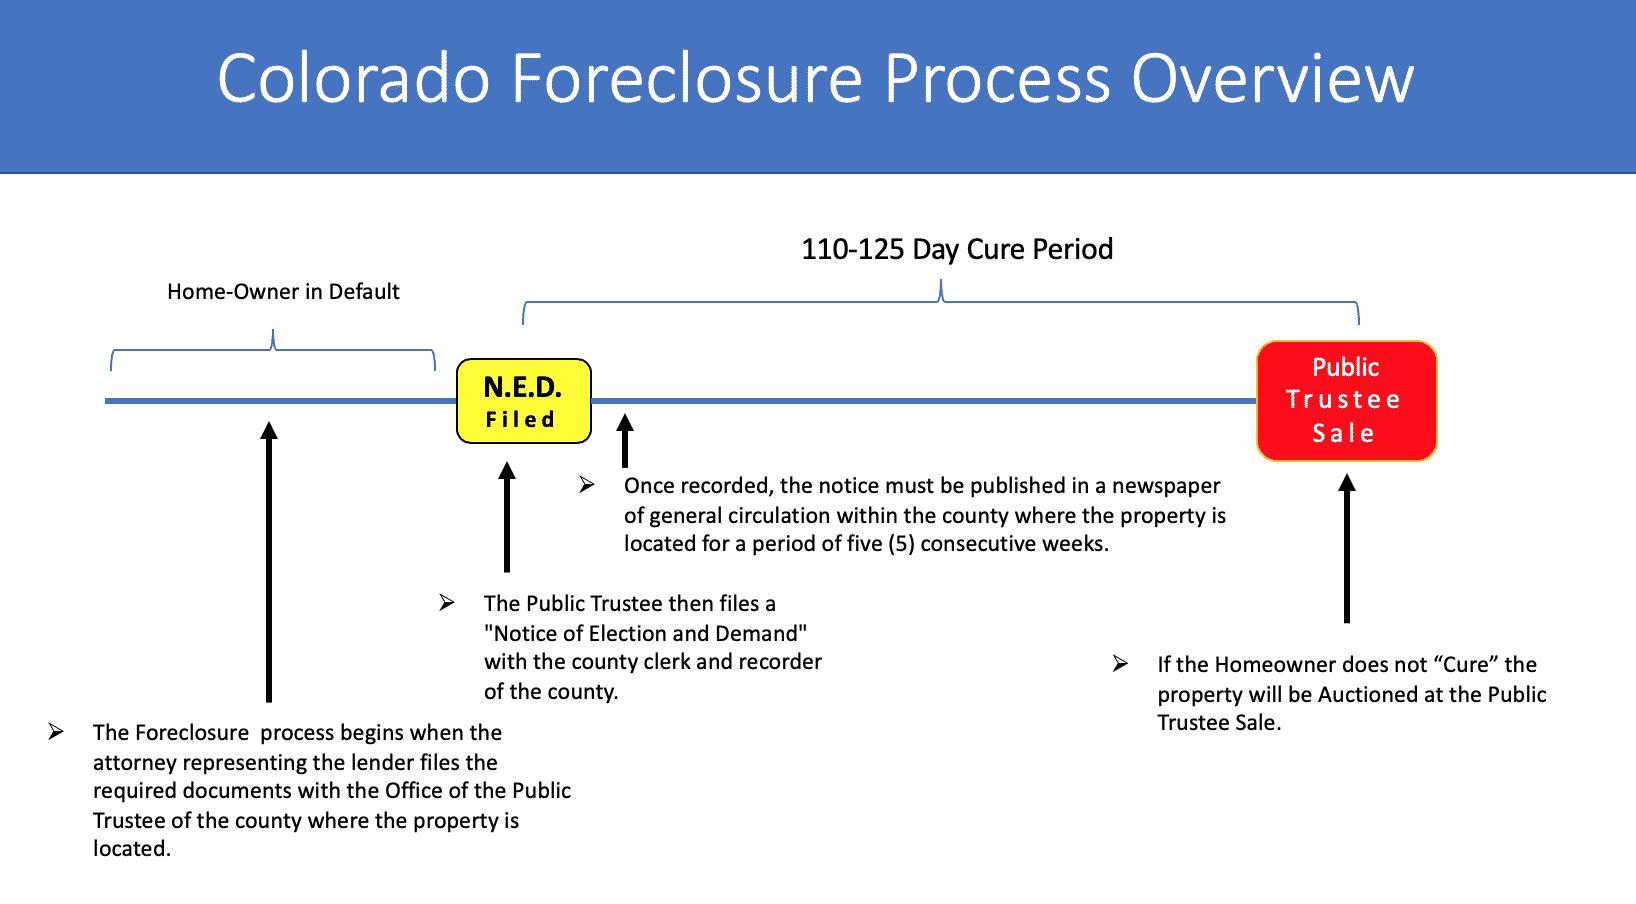 Colorado Foreclosure Process Overview